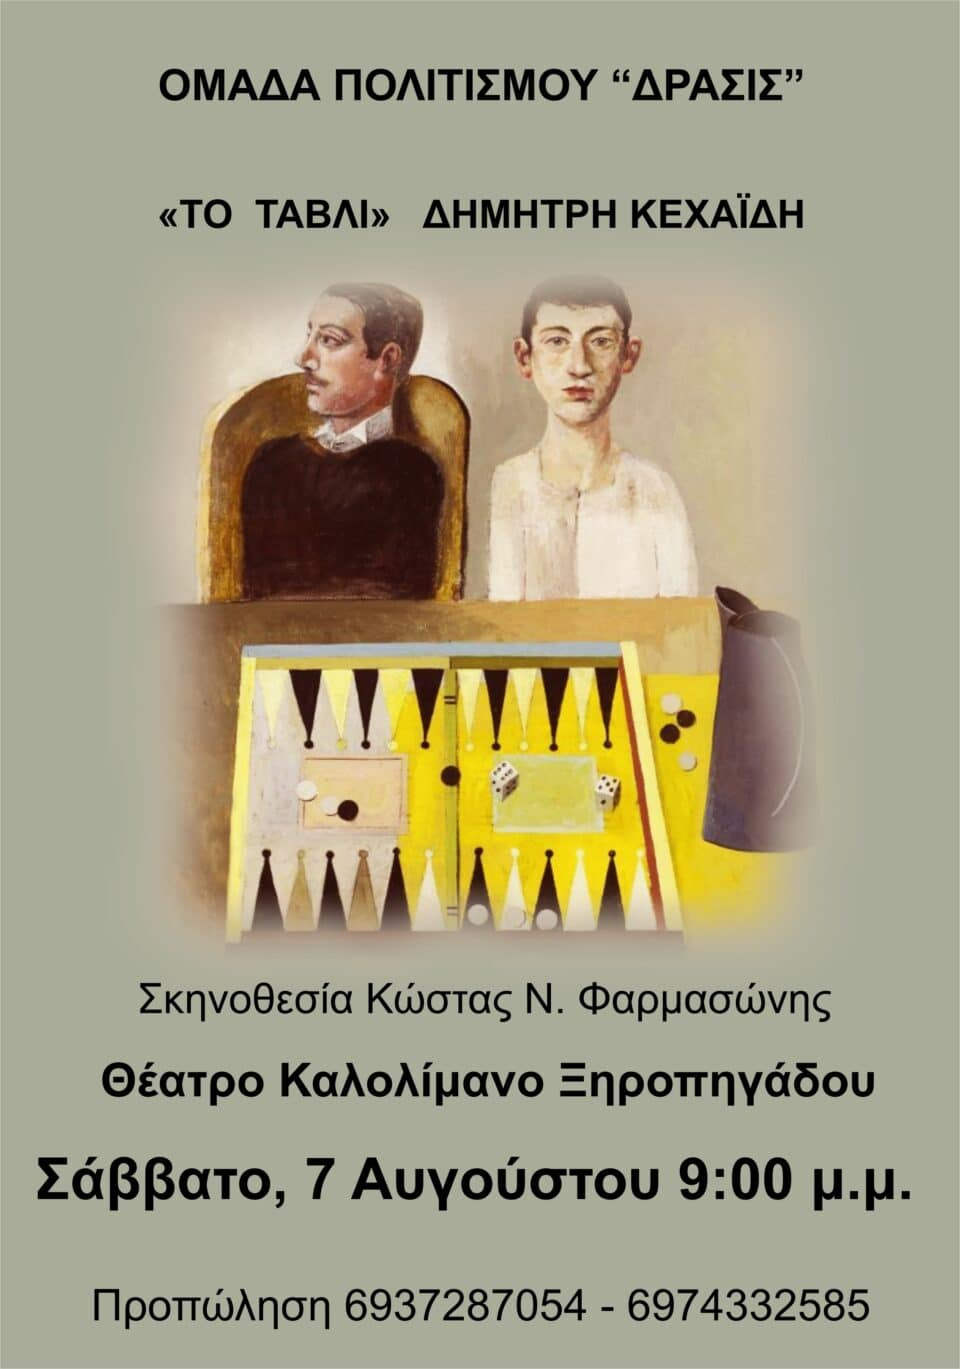 dimitris-kexaidis-to-tavli-xiropigado